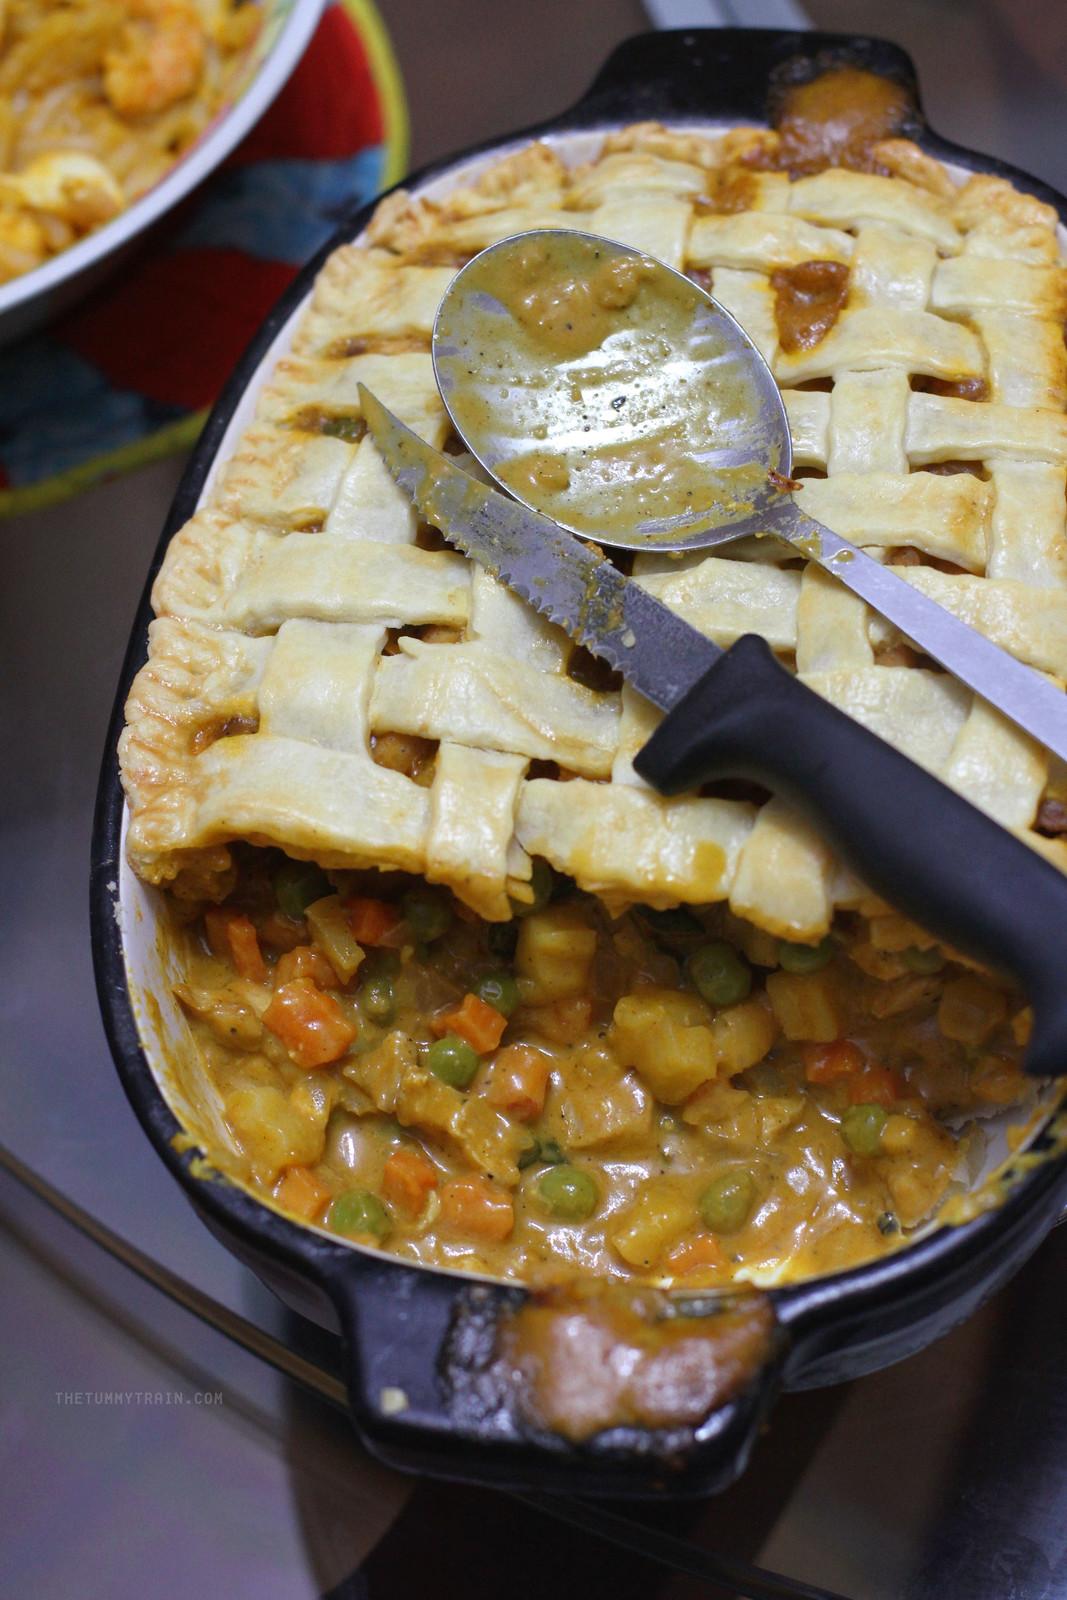 26324616251 dac0f27b05 h - A dreamy Chicken Curry Pot Pie in my pretty KitchenAid Casserole